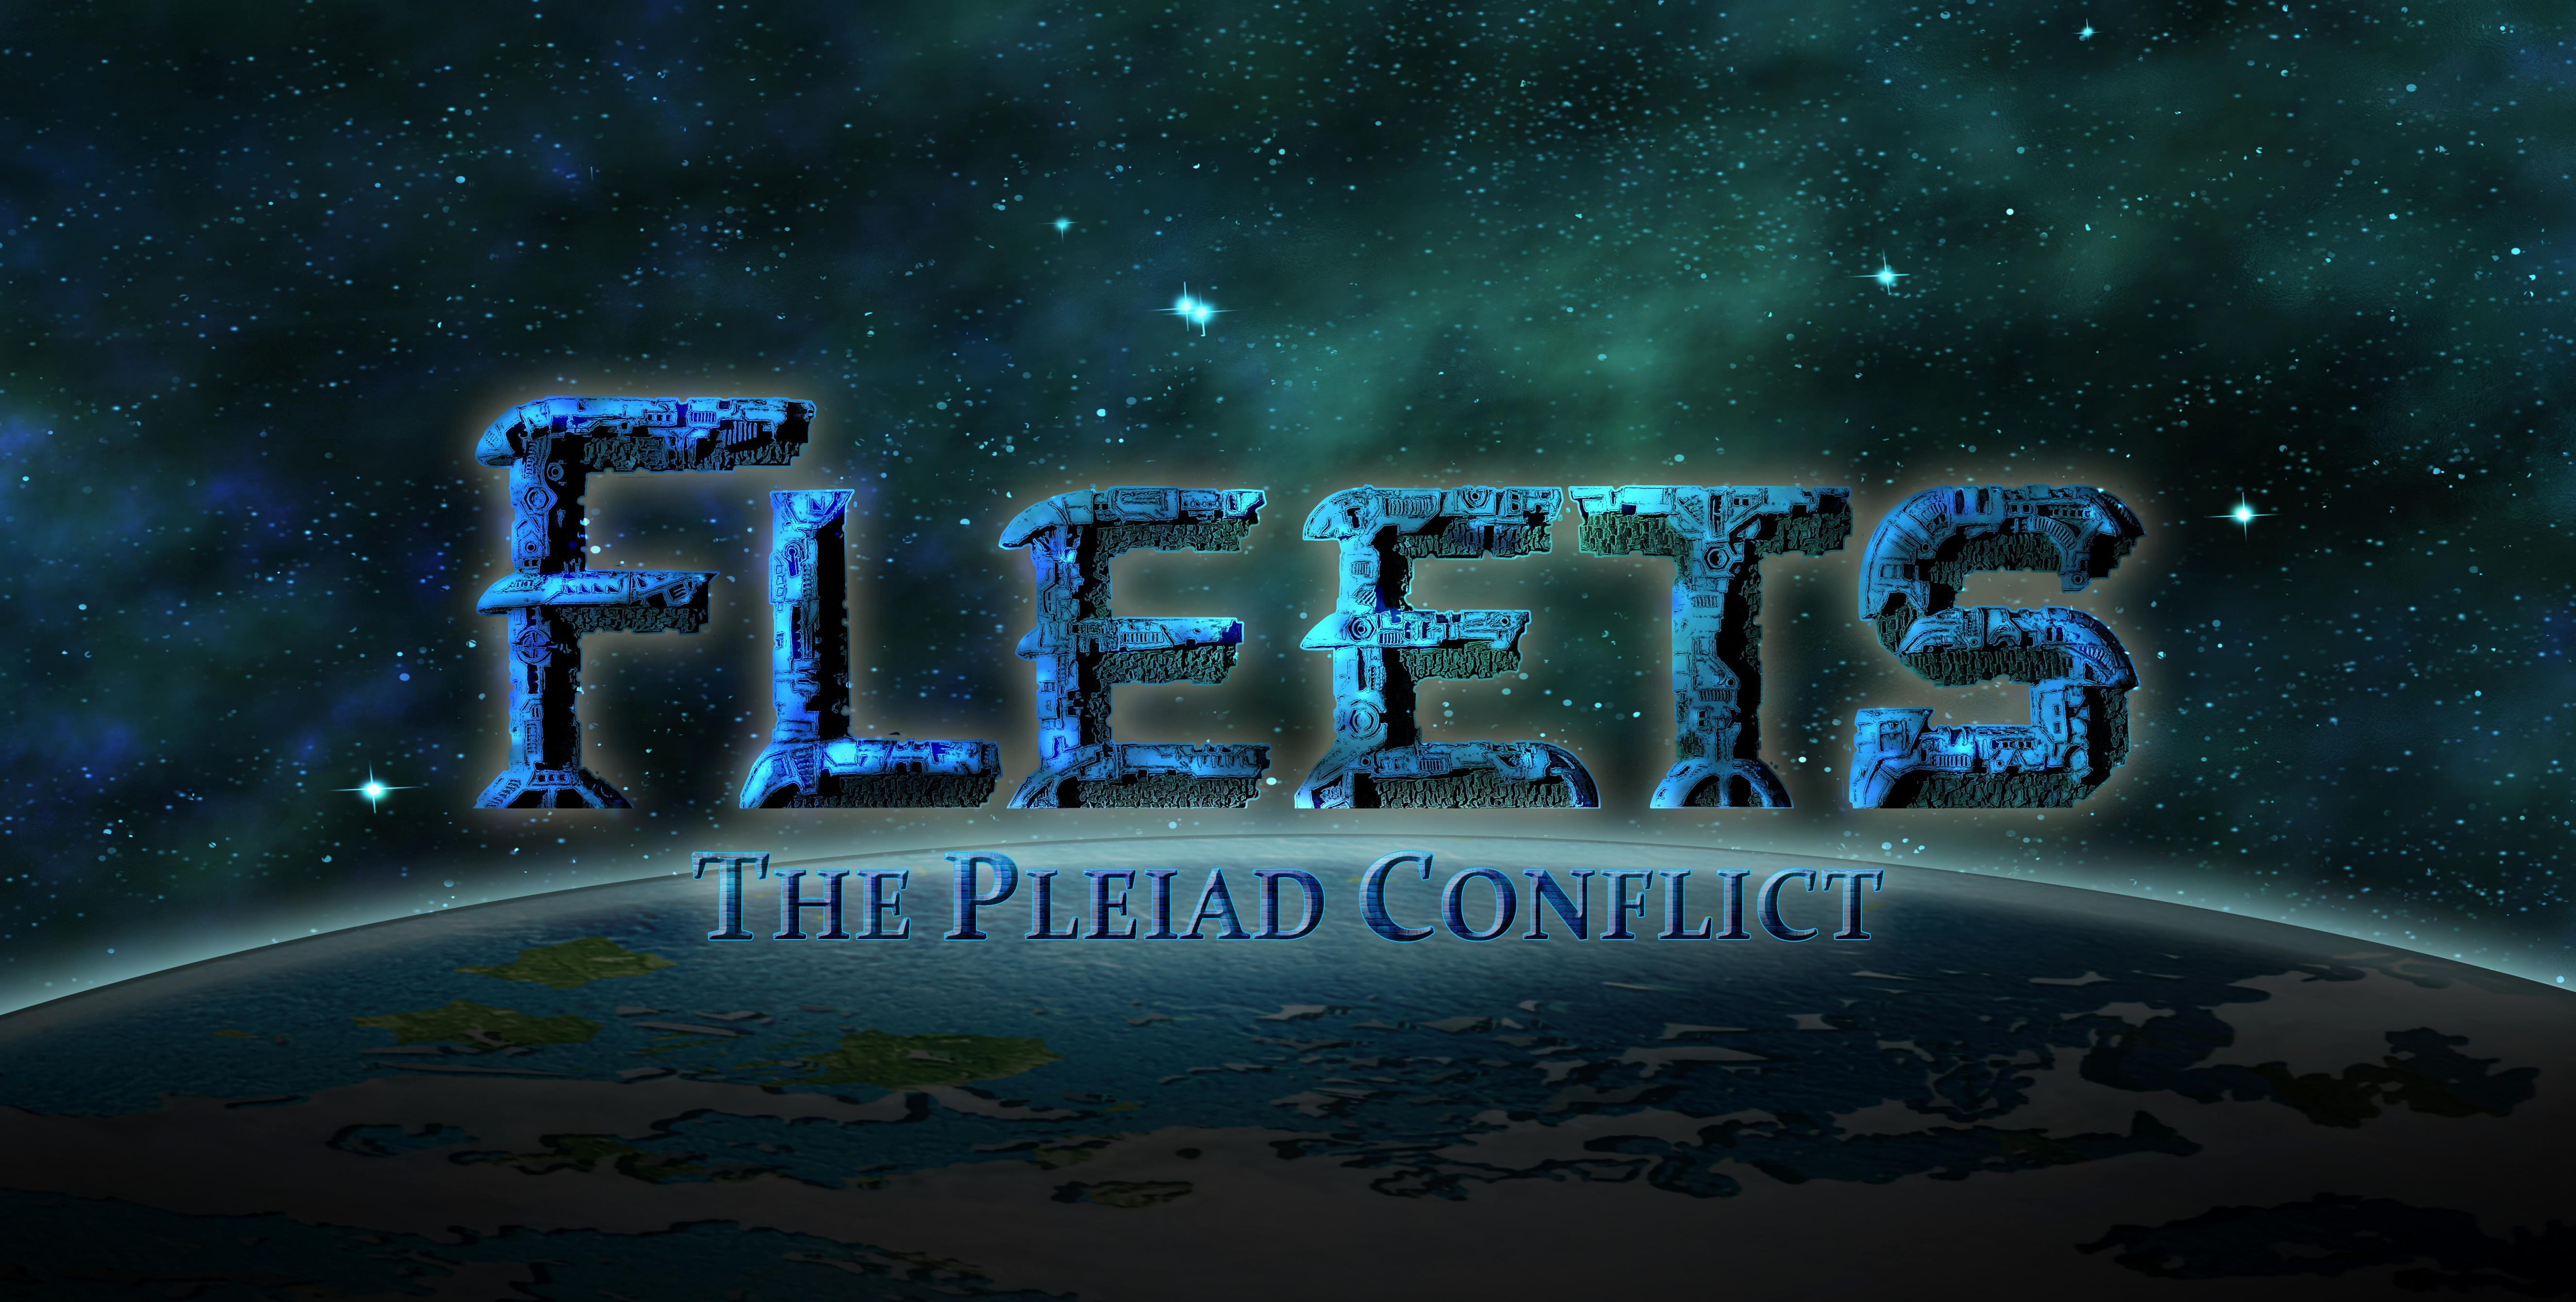 Fleets: The Pleiad Conflict